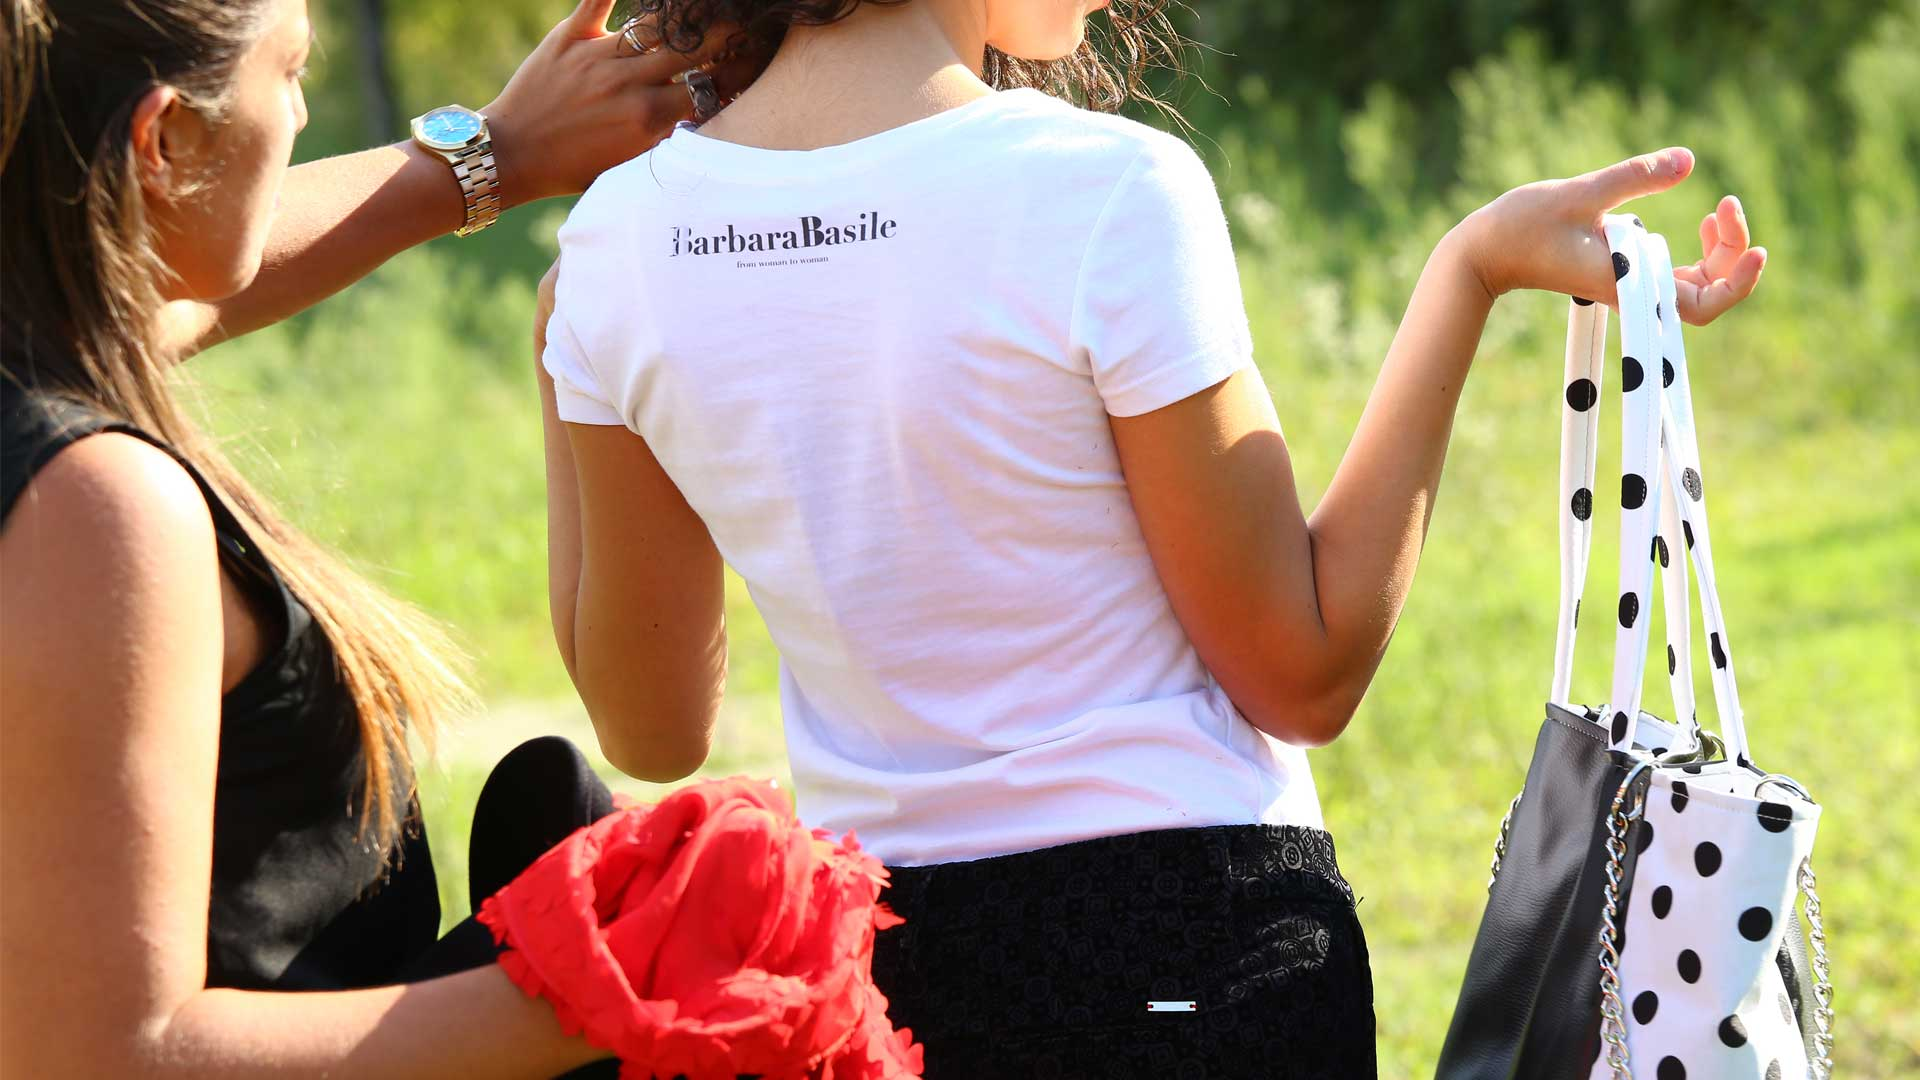 Barbara Basile abbigliamento donna